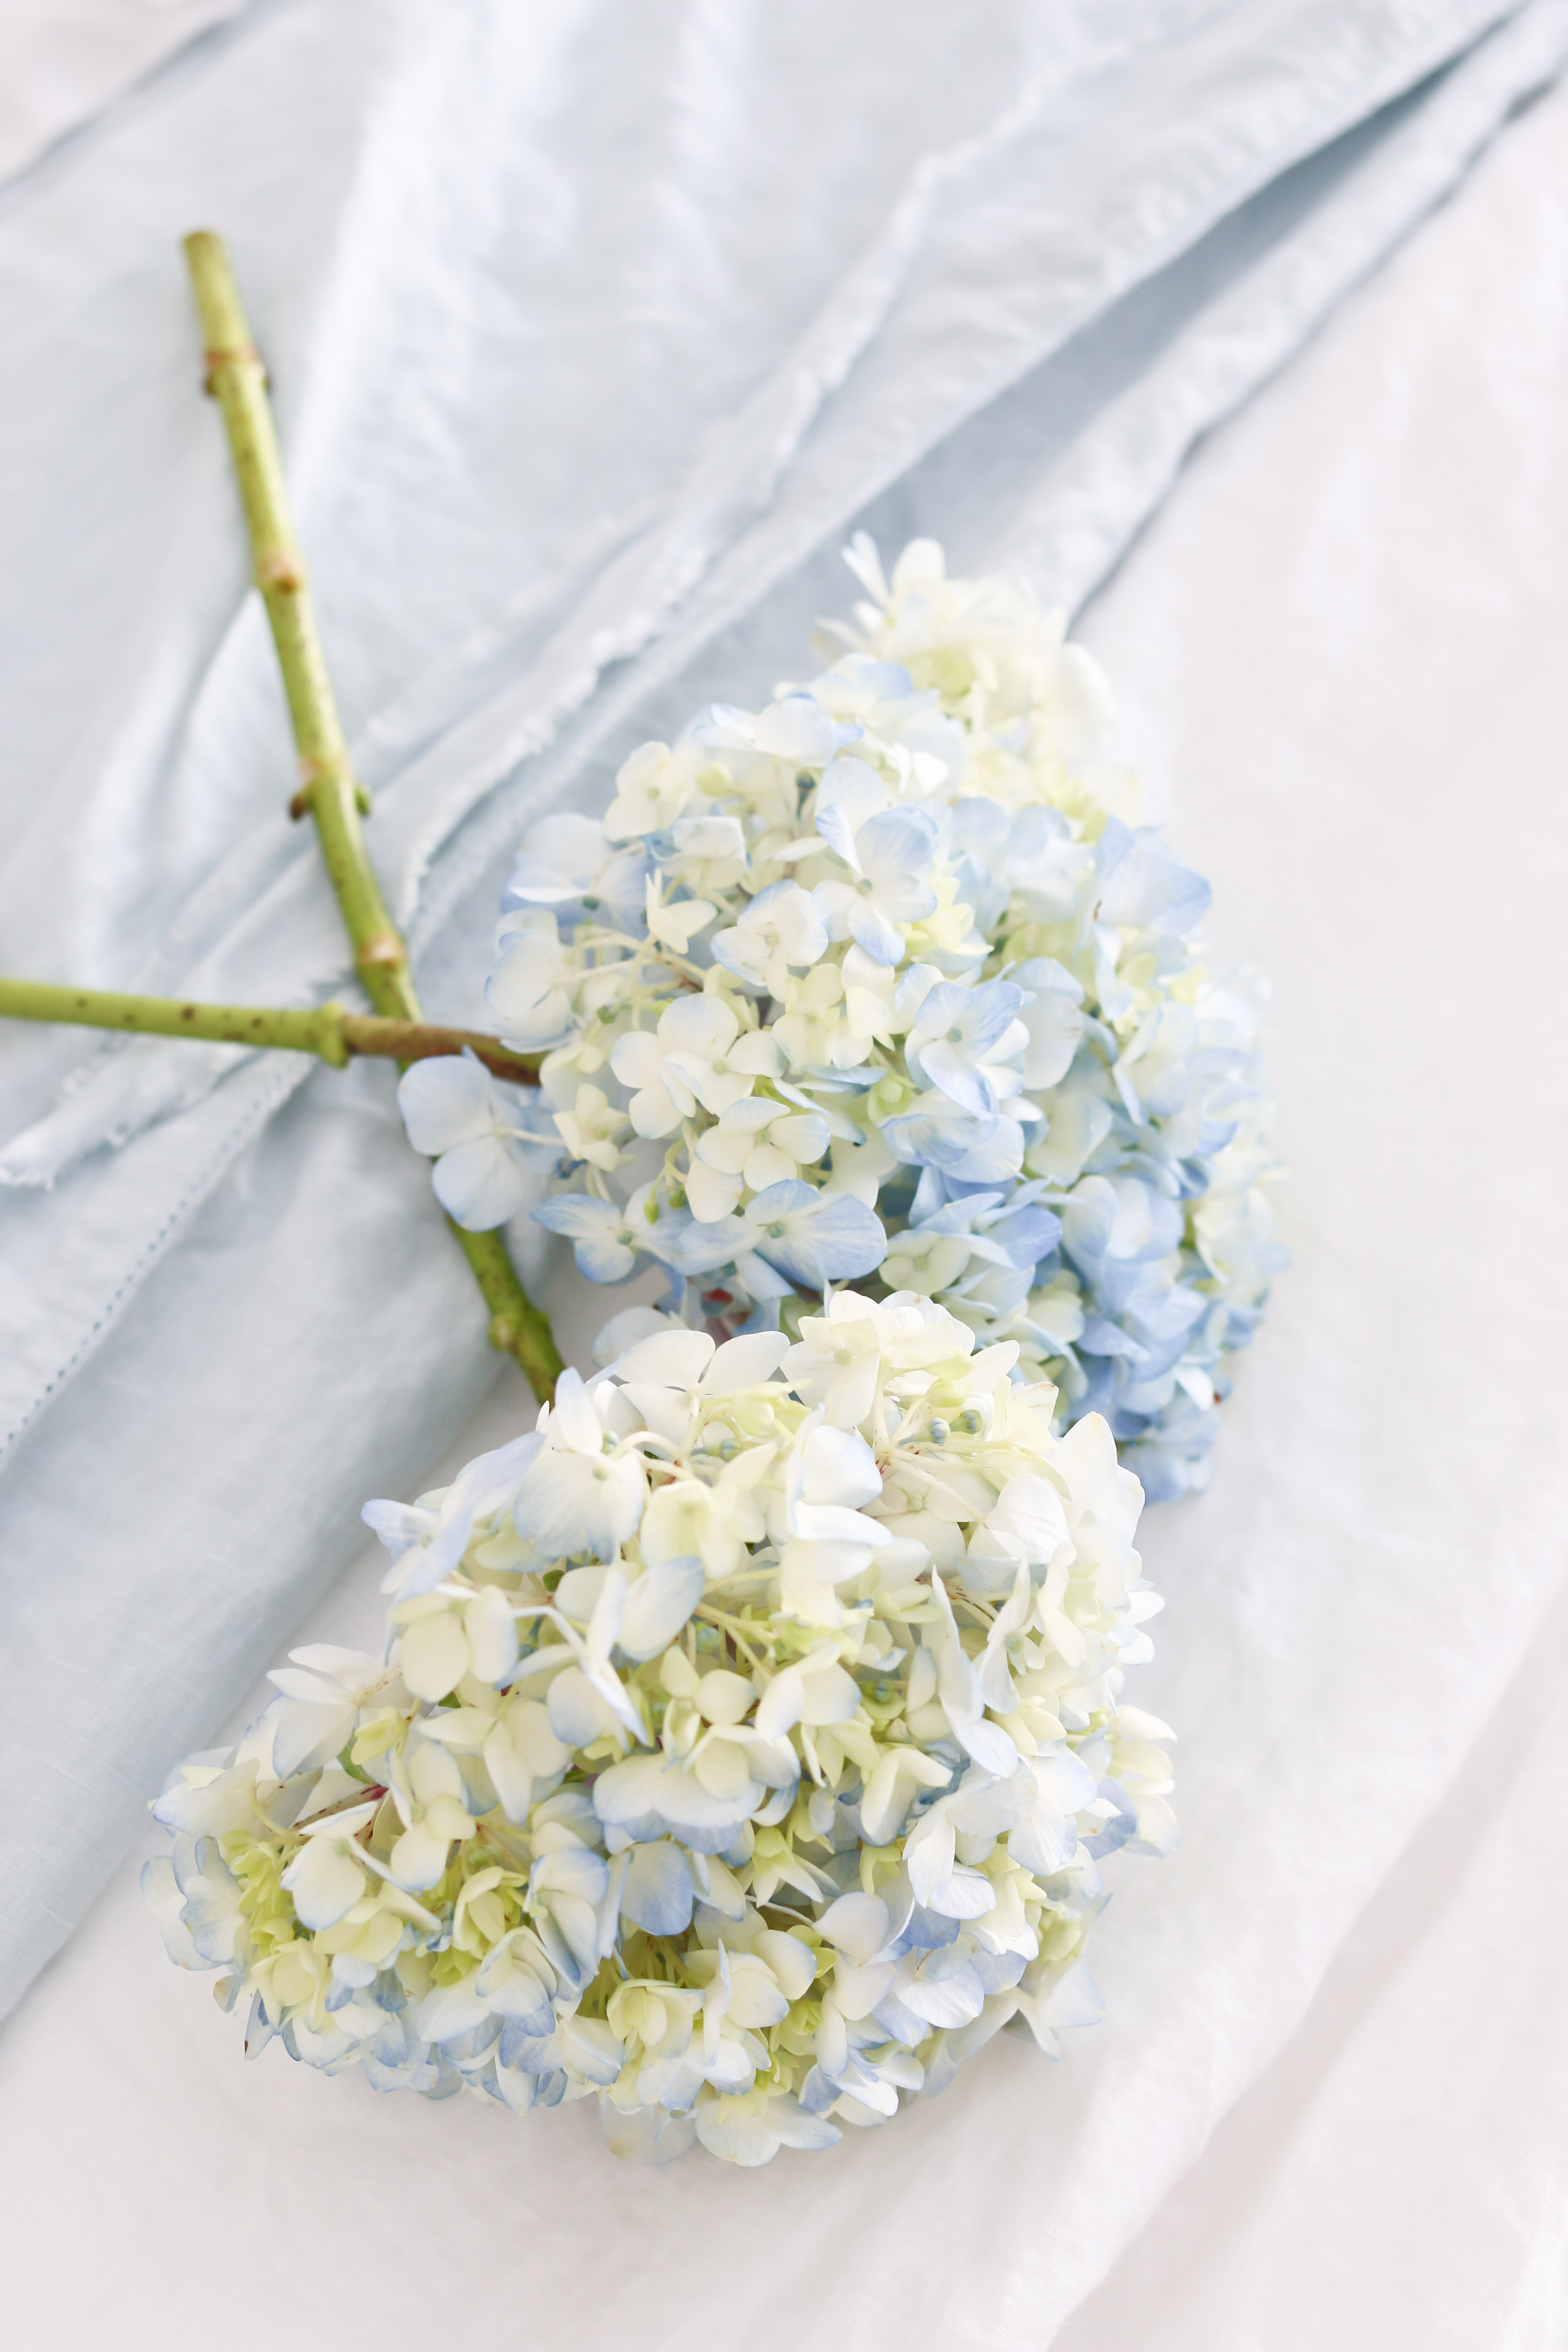 Spring Bedroom Tour Linen Sheets-62